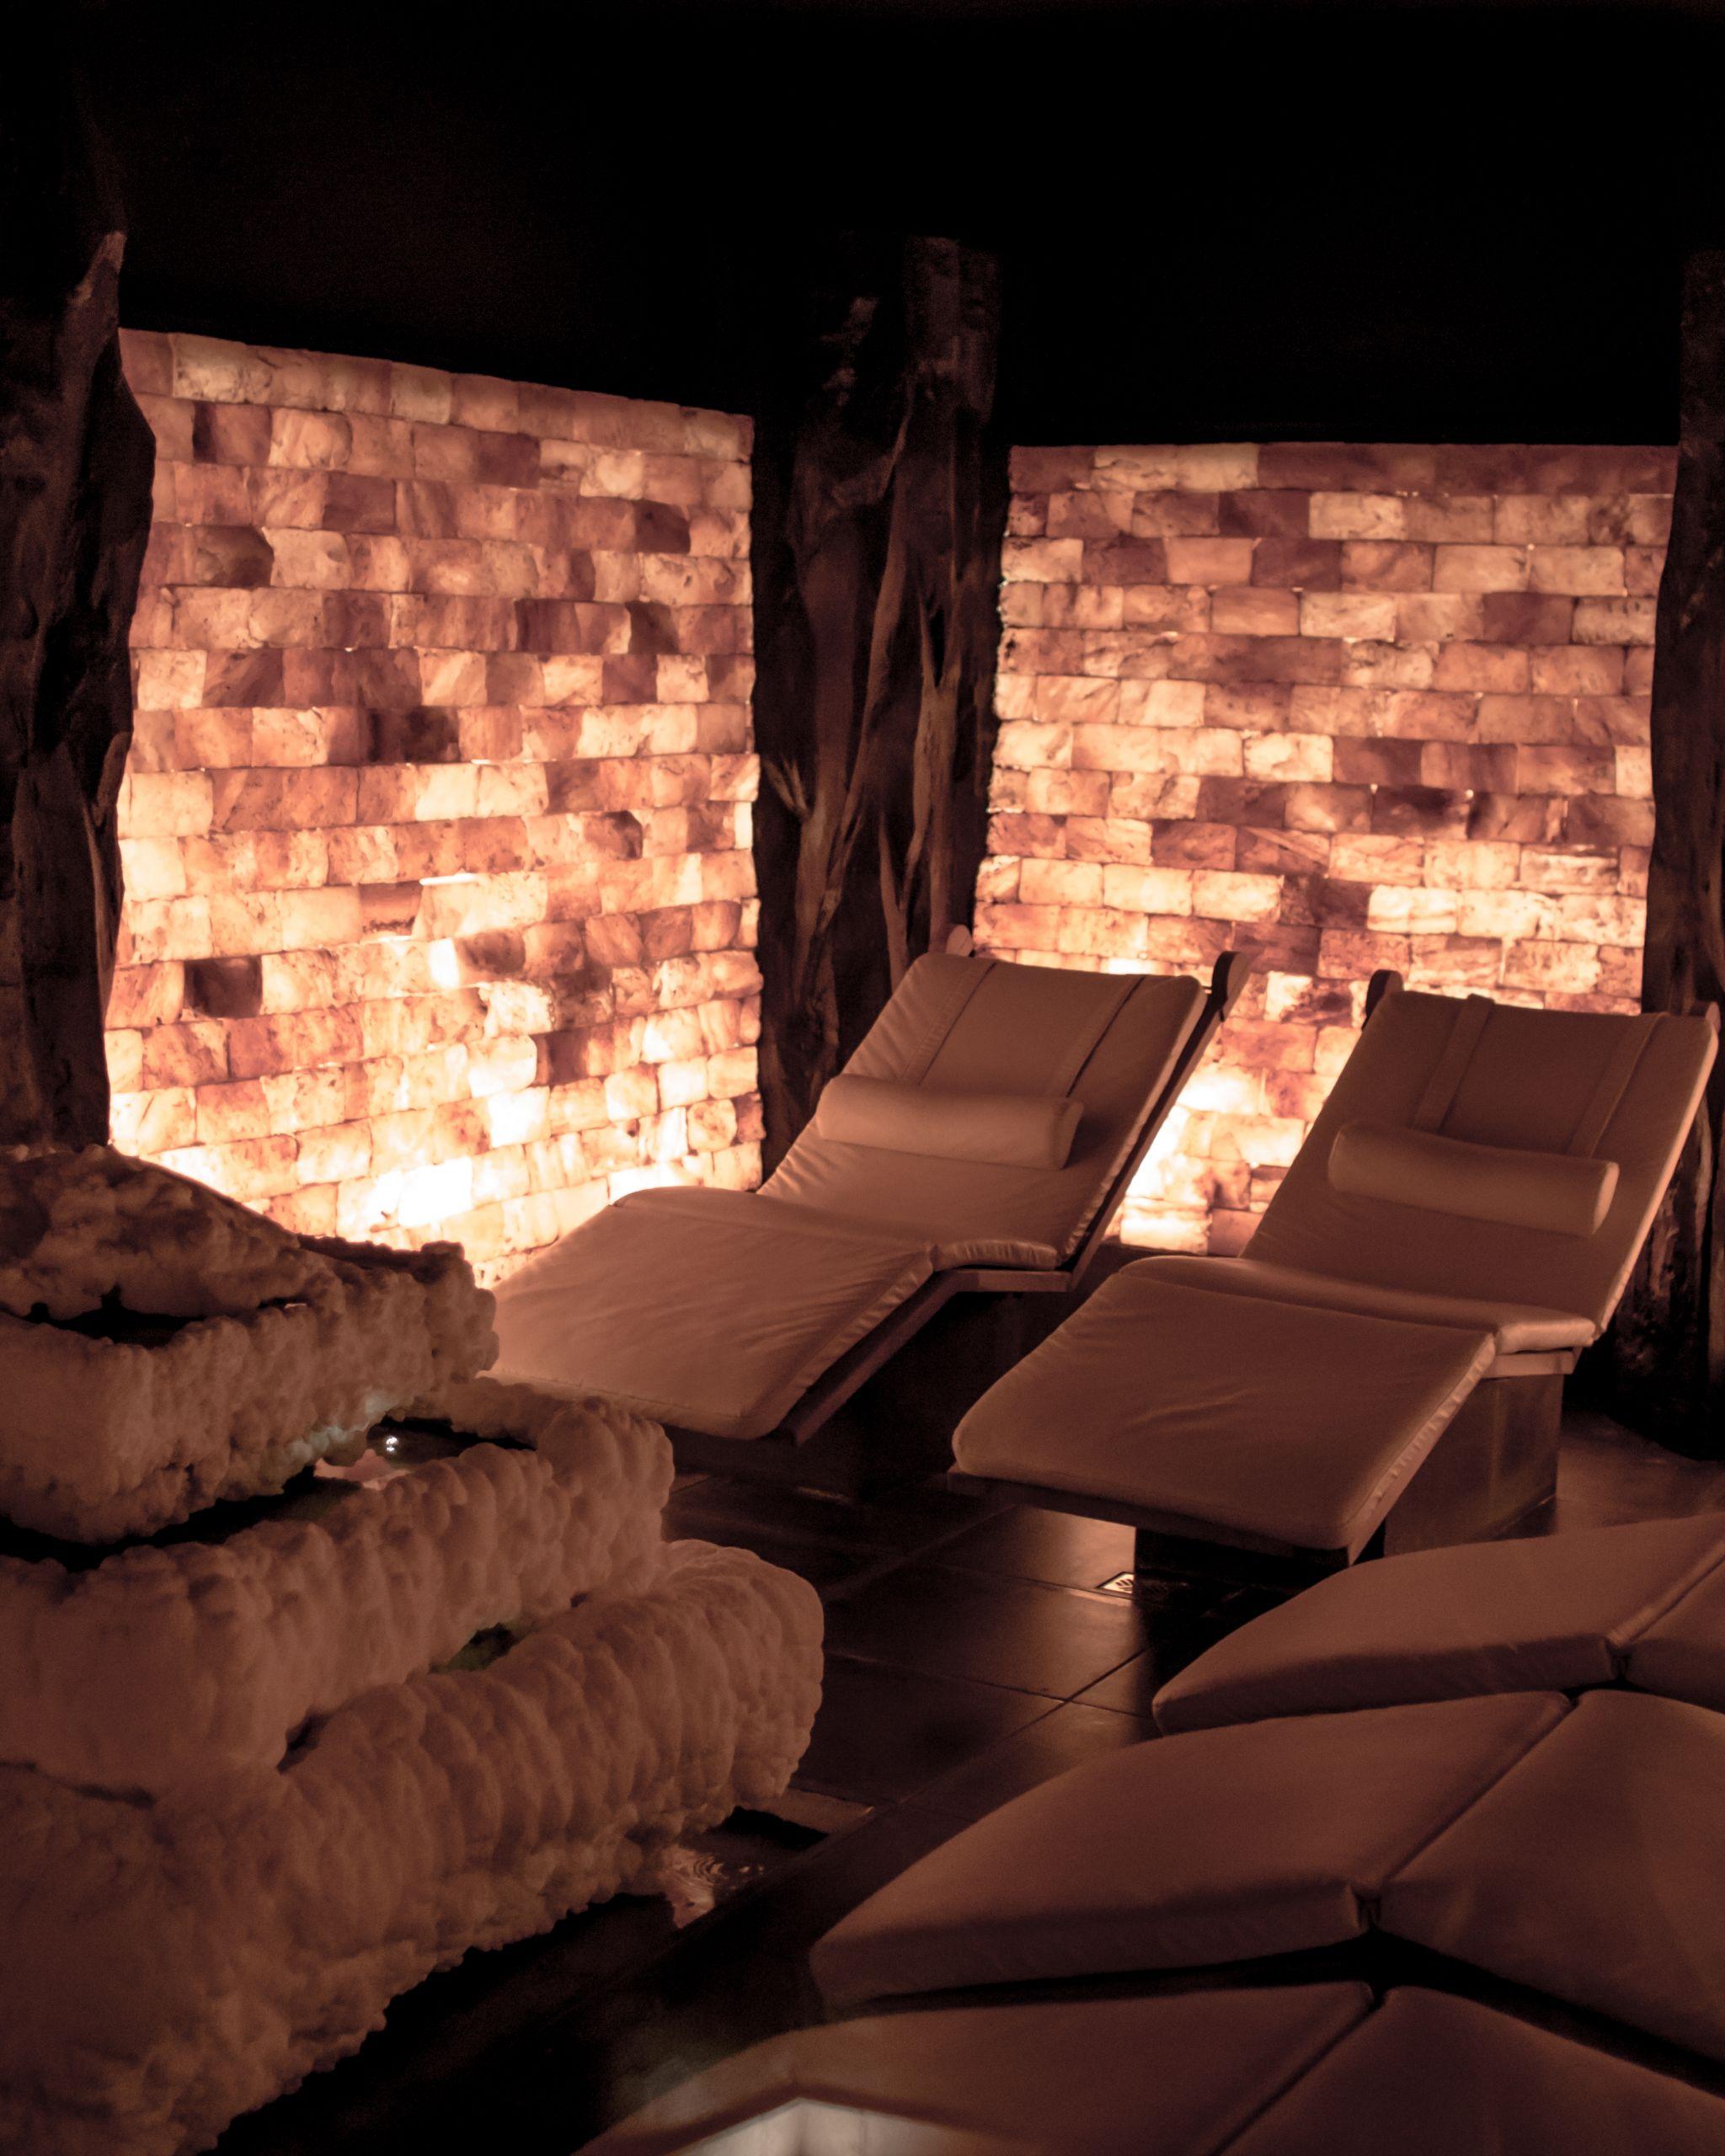 Adler Dolomites Hotel Ortisei Italy Hotel Review Himalayan Salt Sauna